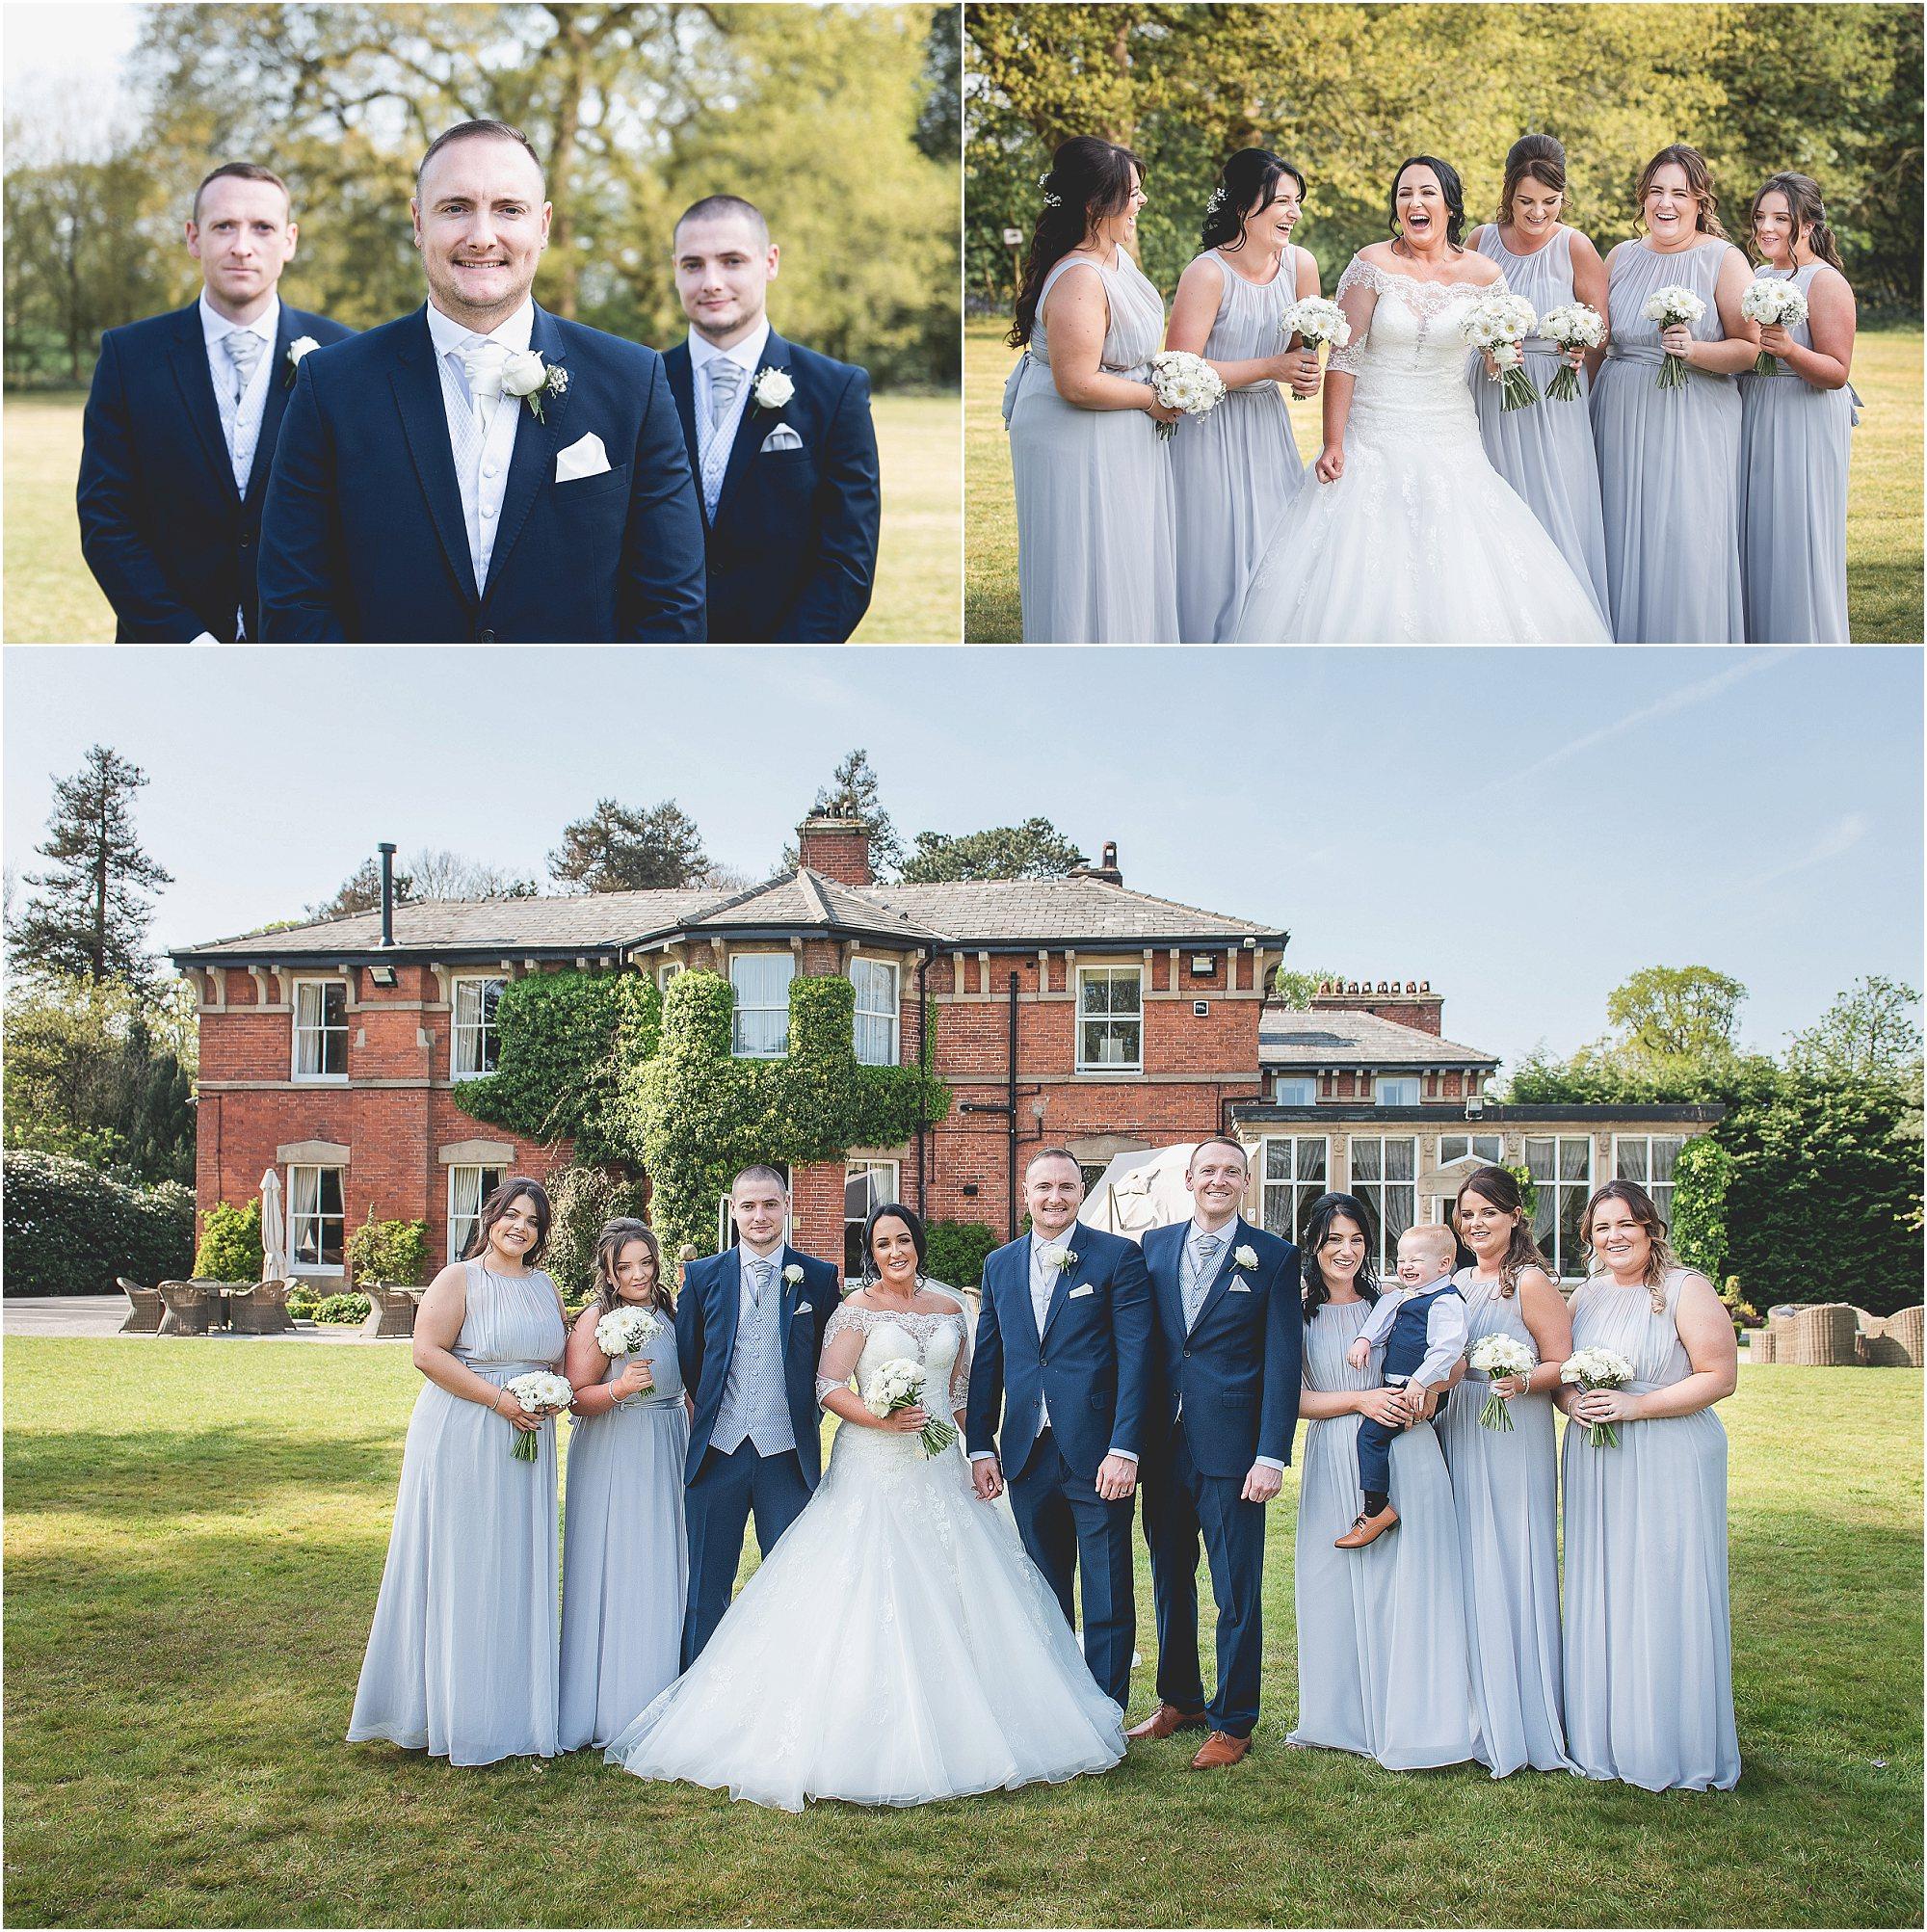 Wedding group shots at bartle hall